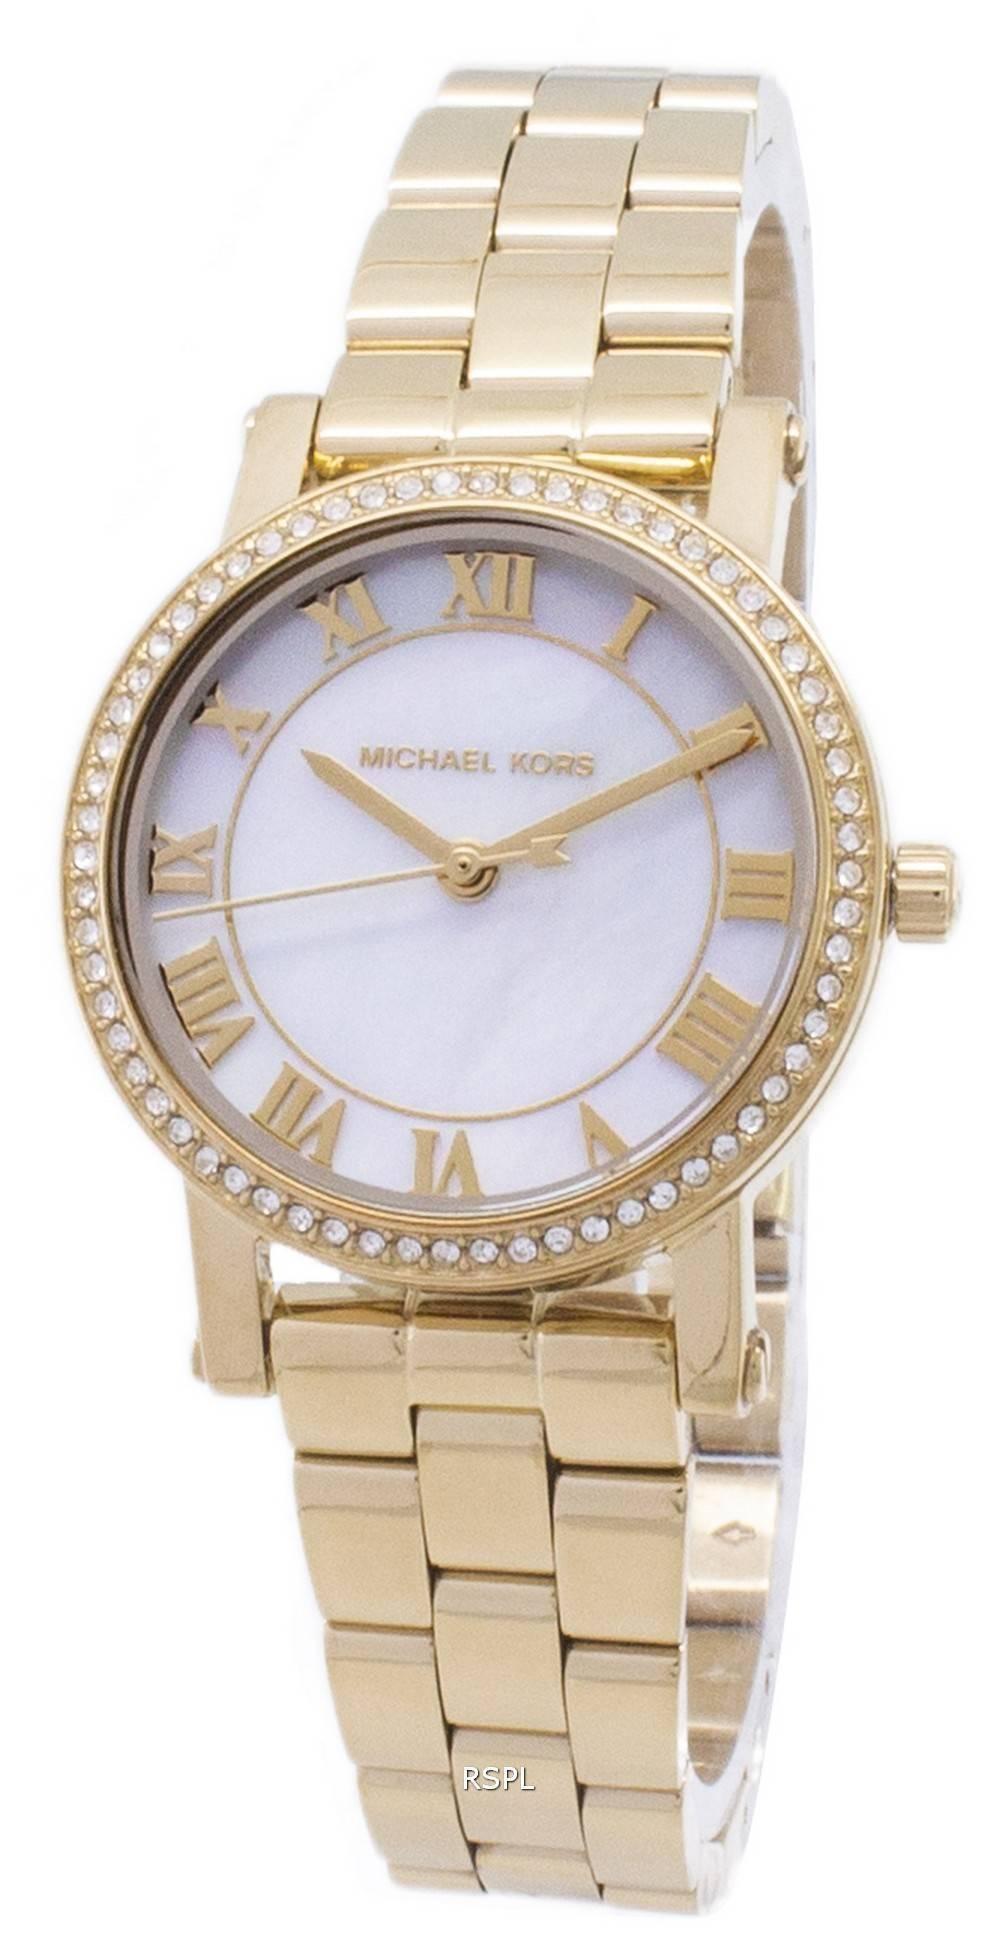 5e473c013bb2 Michael Kors Petite Norie Quartz Diamond Accent MK3682 Women s Watch ...